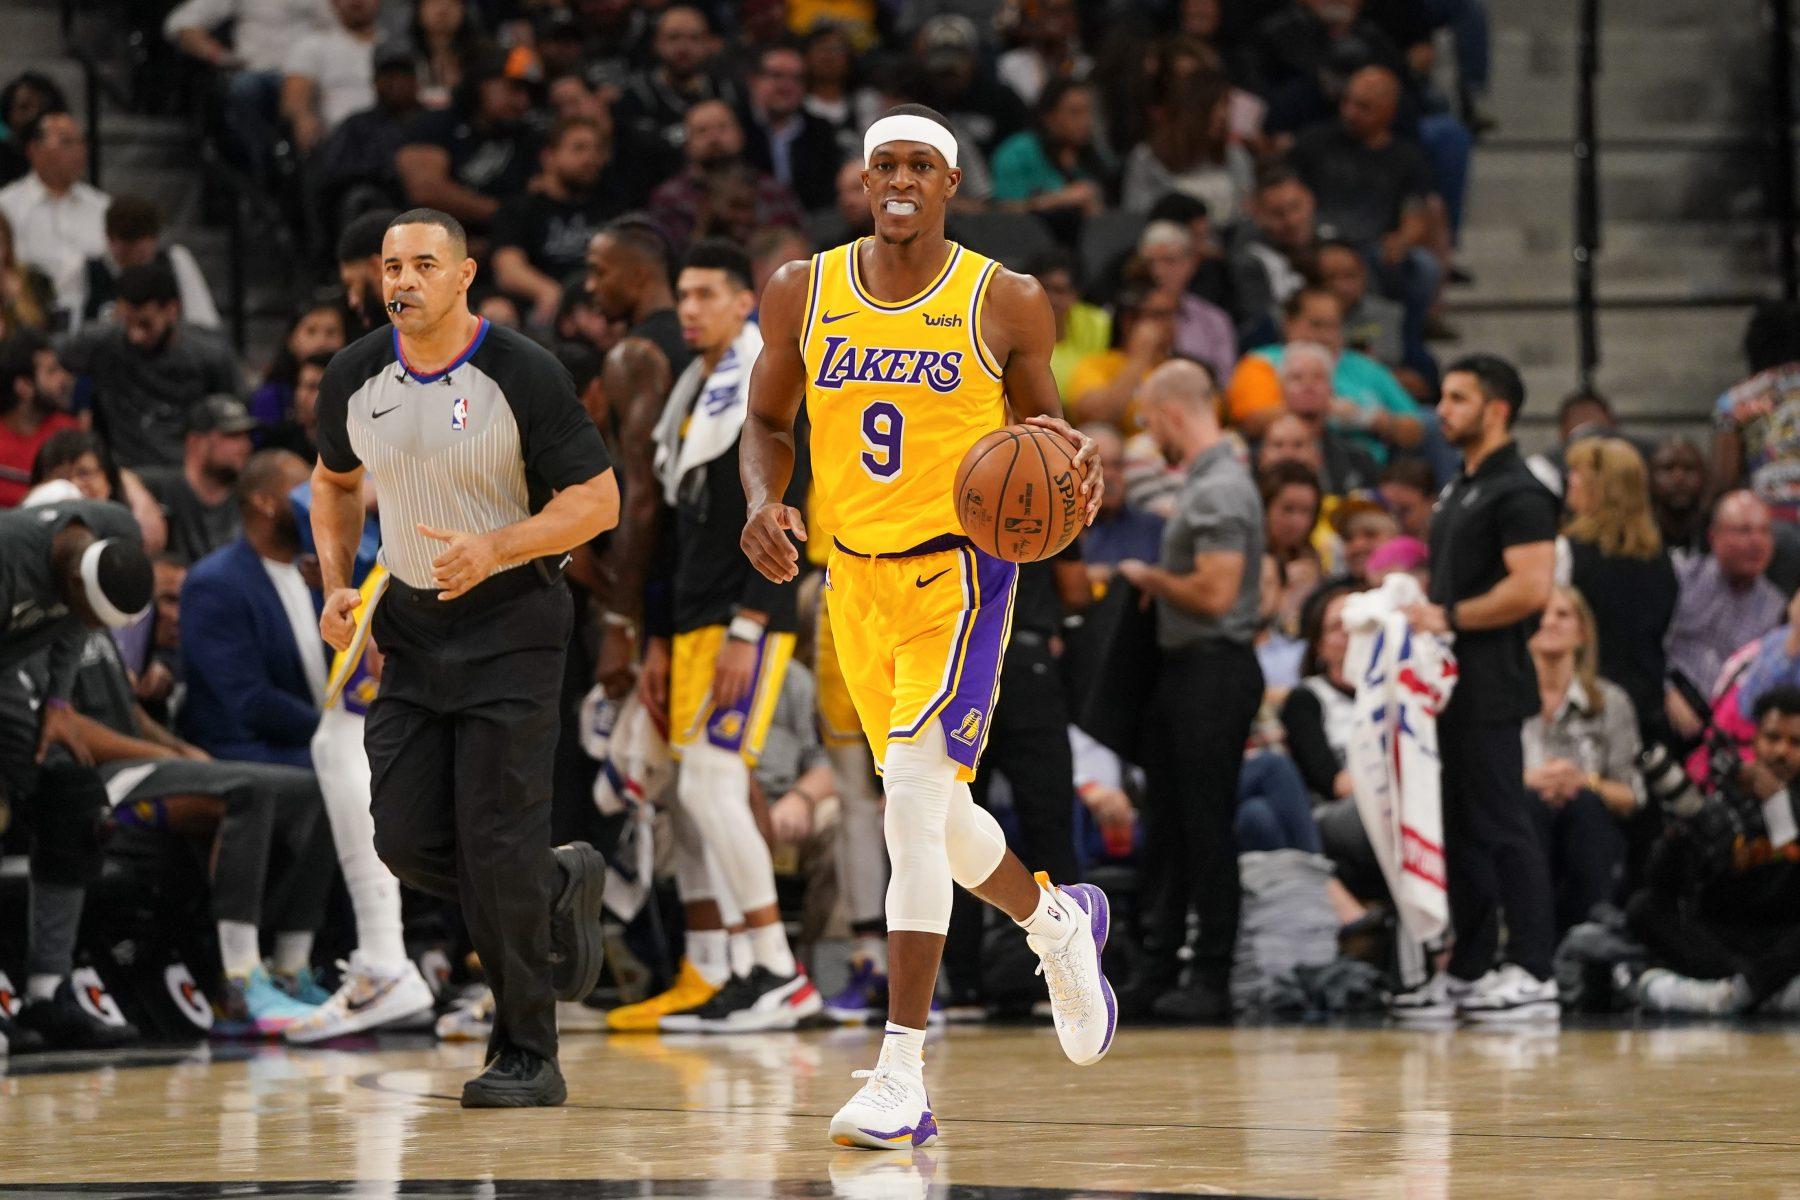 Lakers News: Rajon Rondo Suffers Injury vs. Portland Trail ...